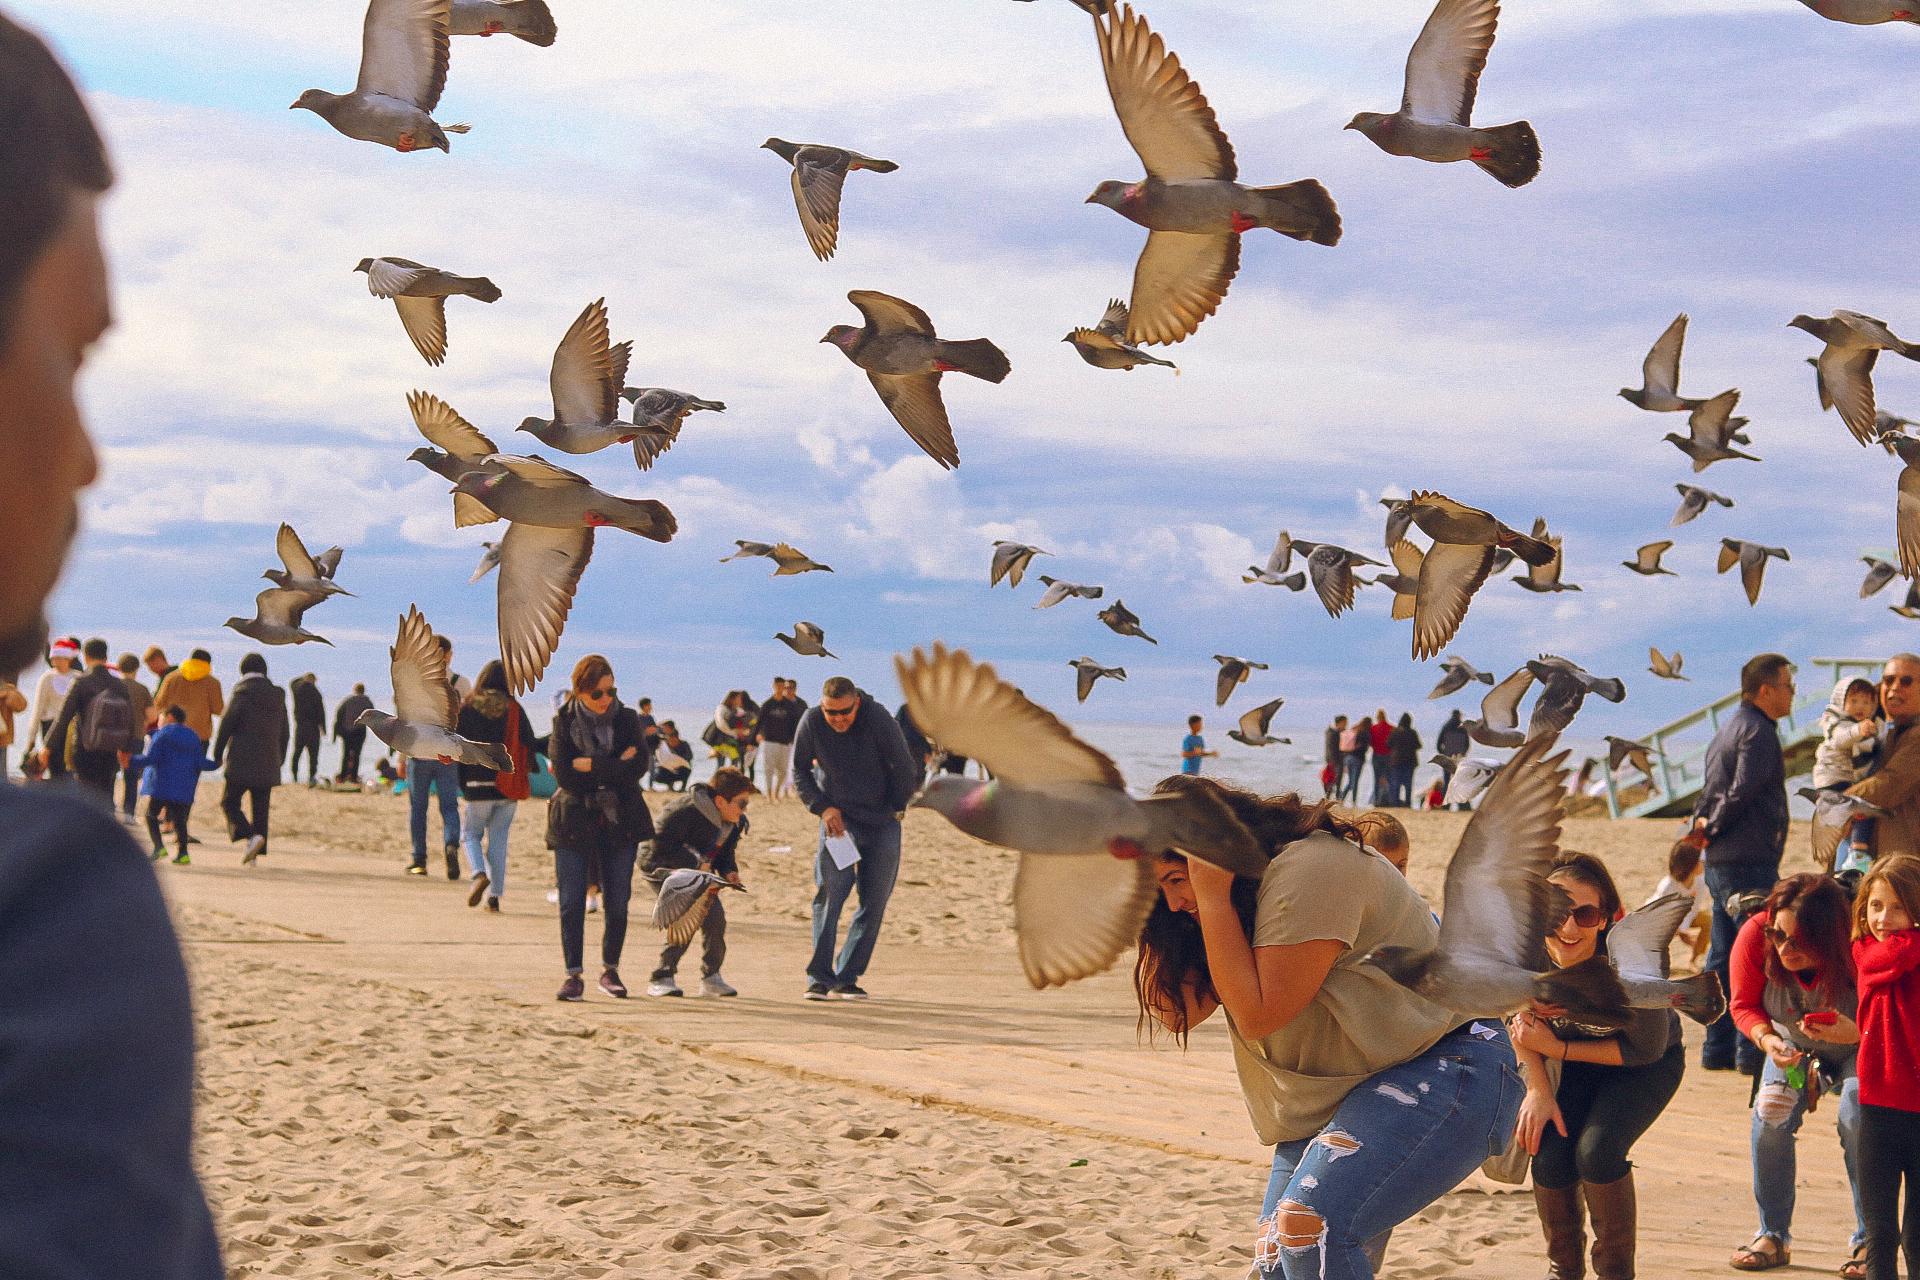 Birds swarming beachgoers, Los Angeles